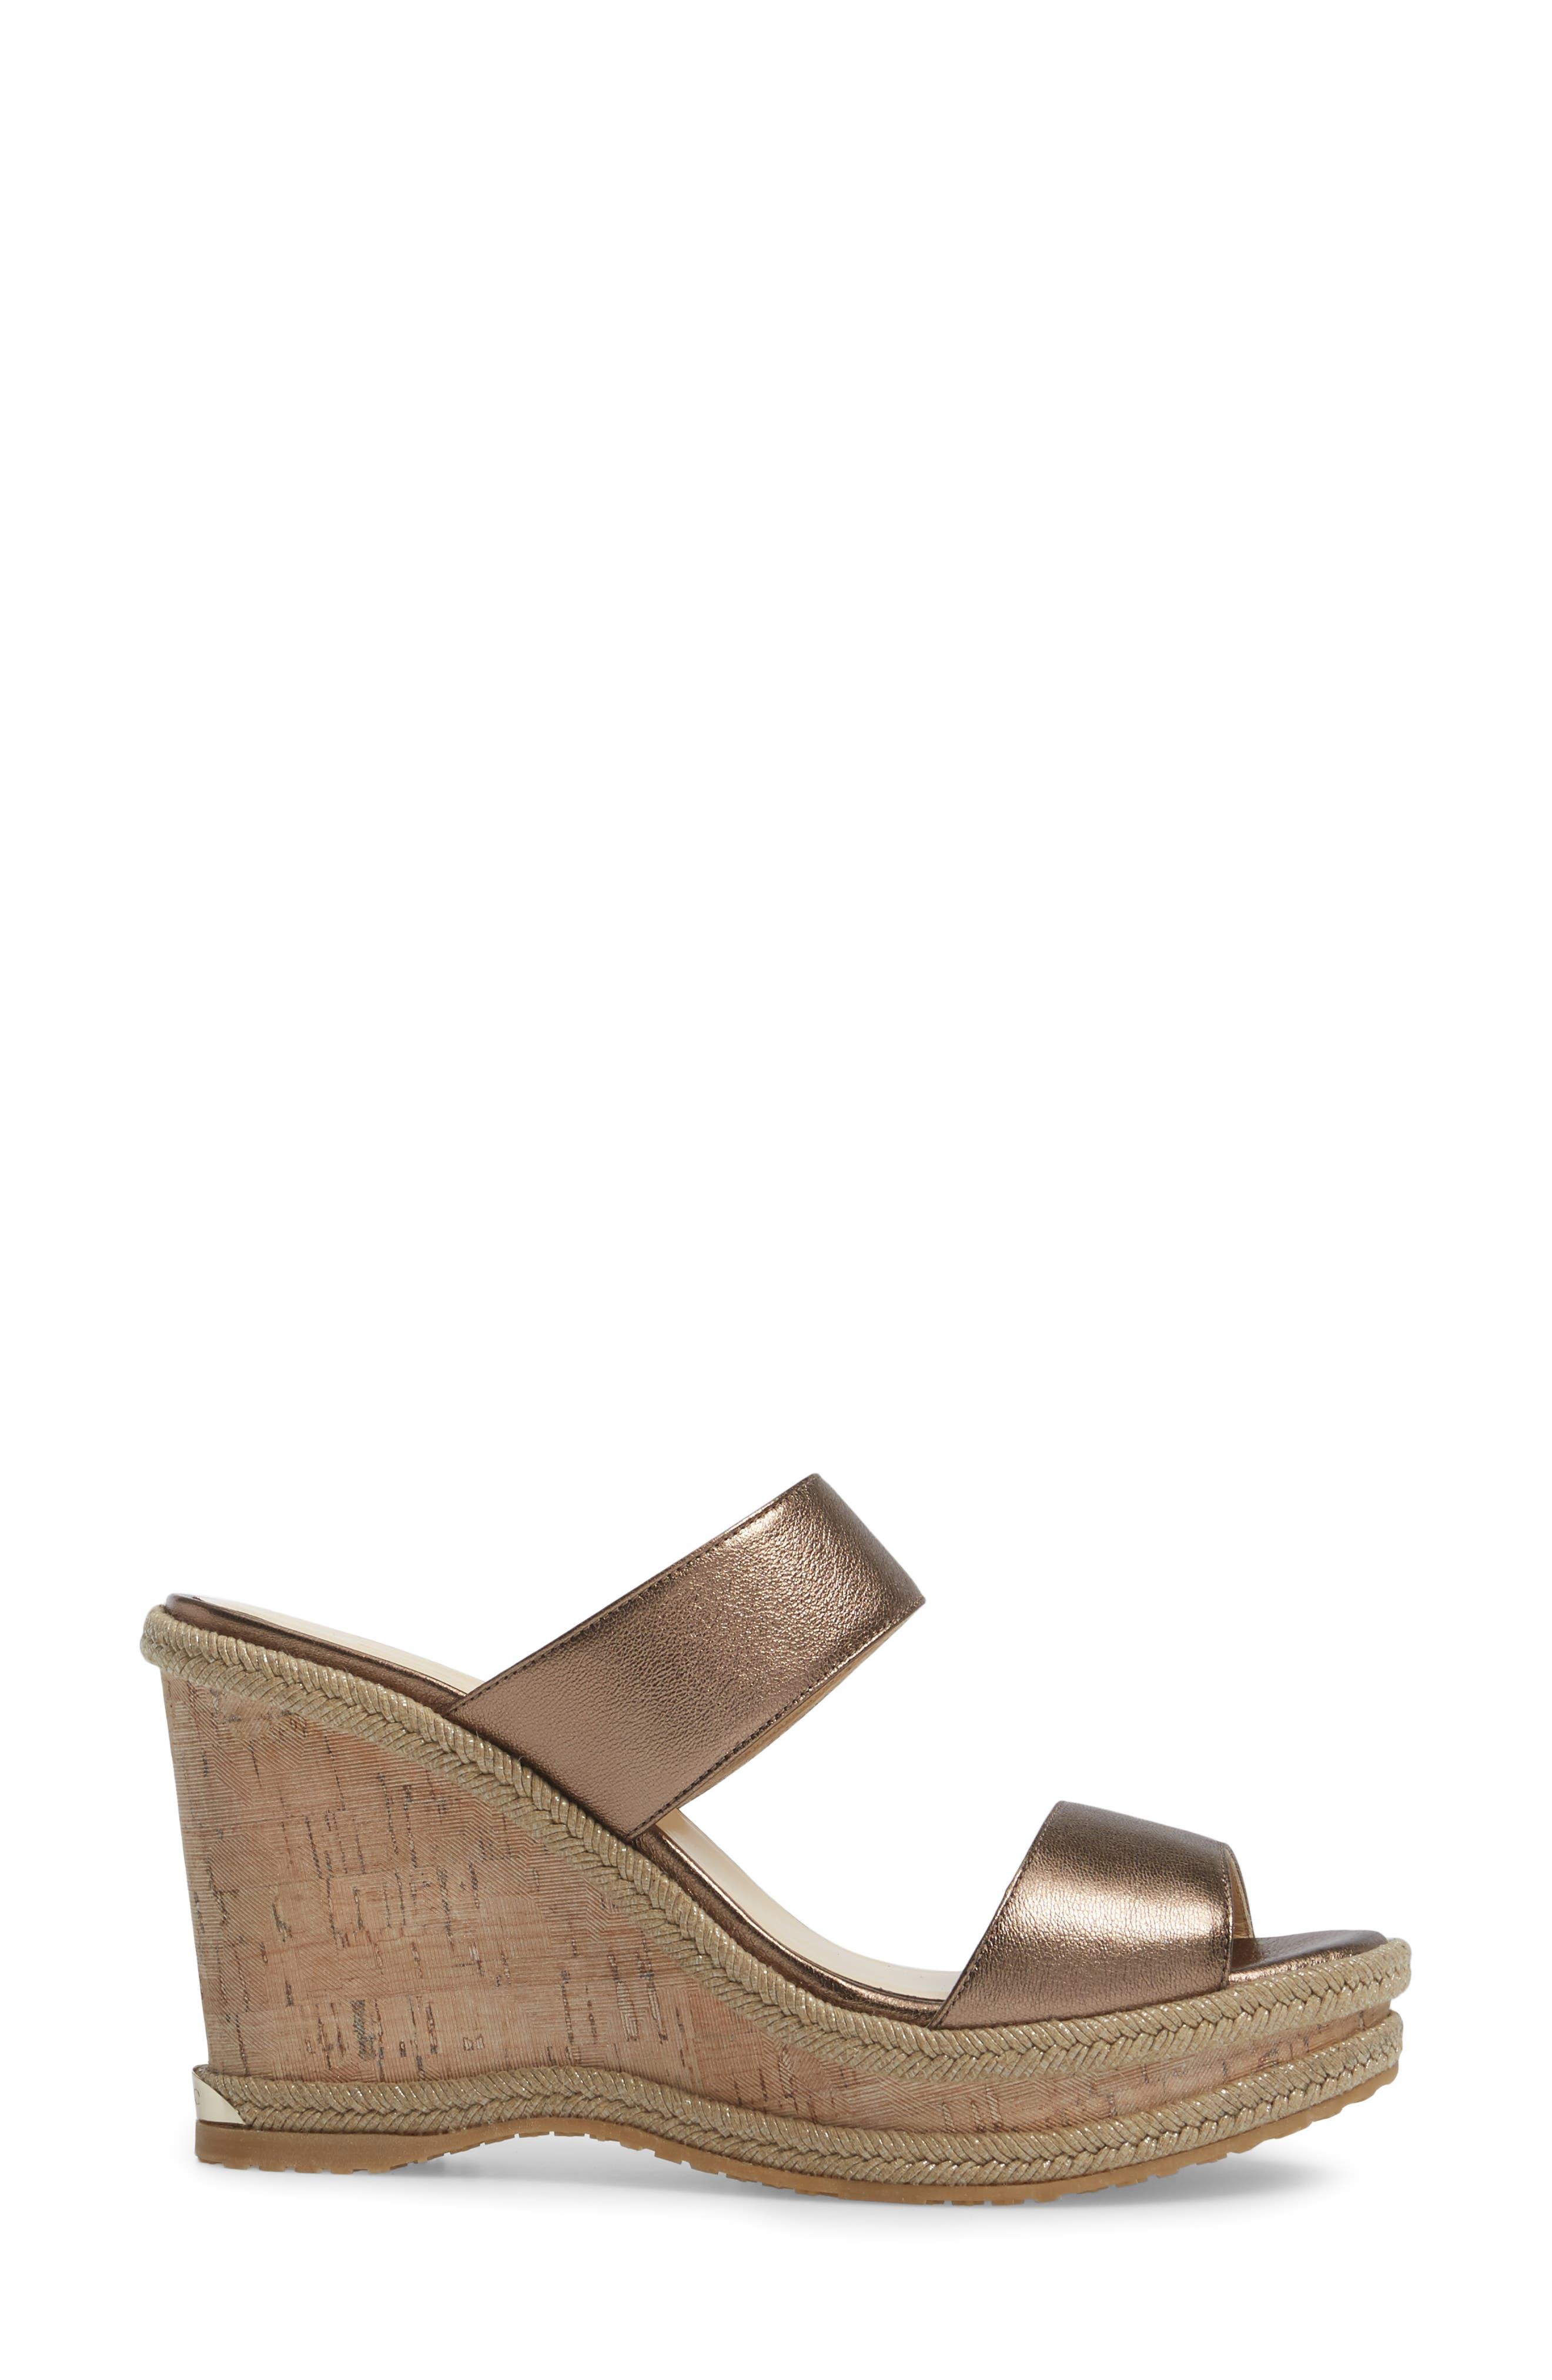 Alternate Image 3  - Jimmy Choo Parker Wedge Sandal (Women)